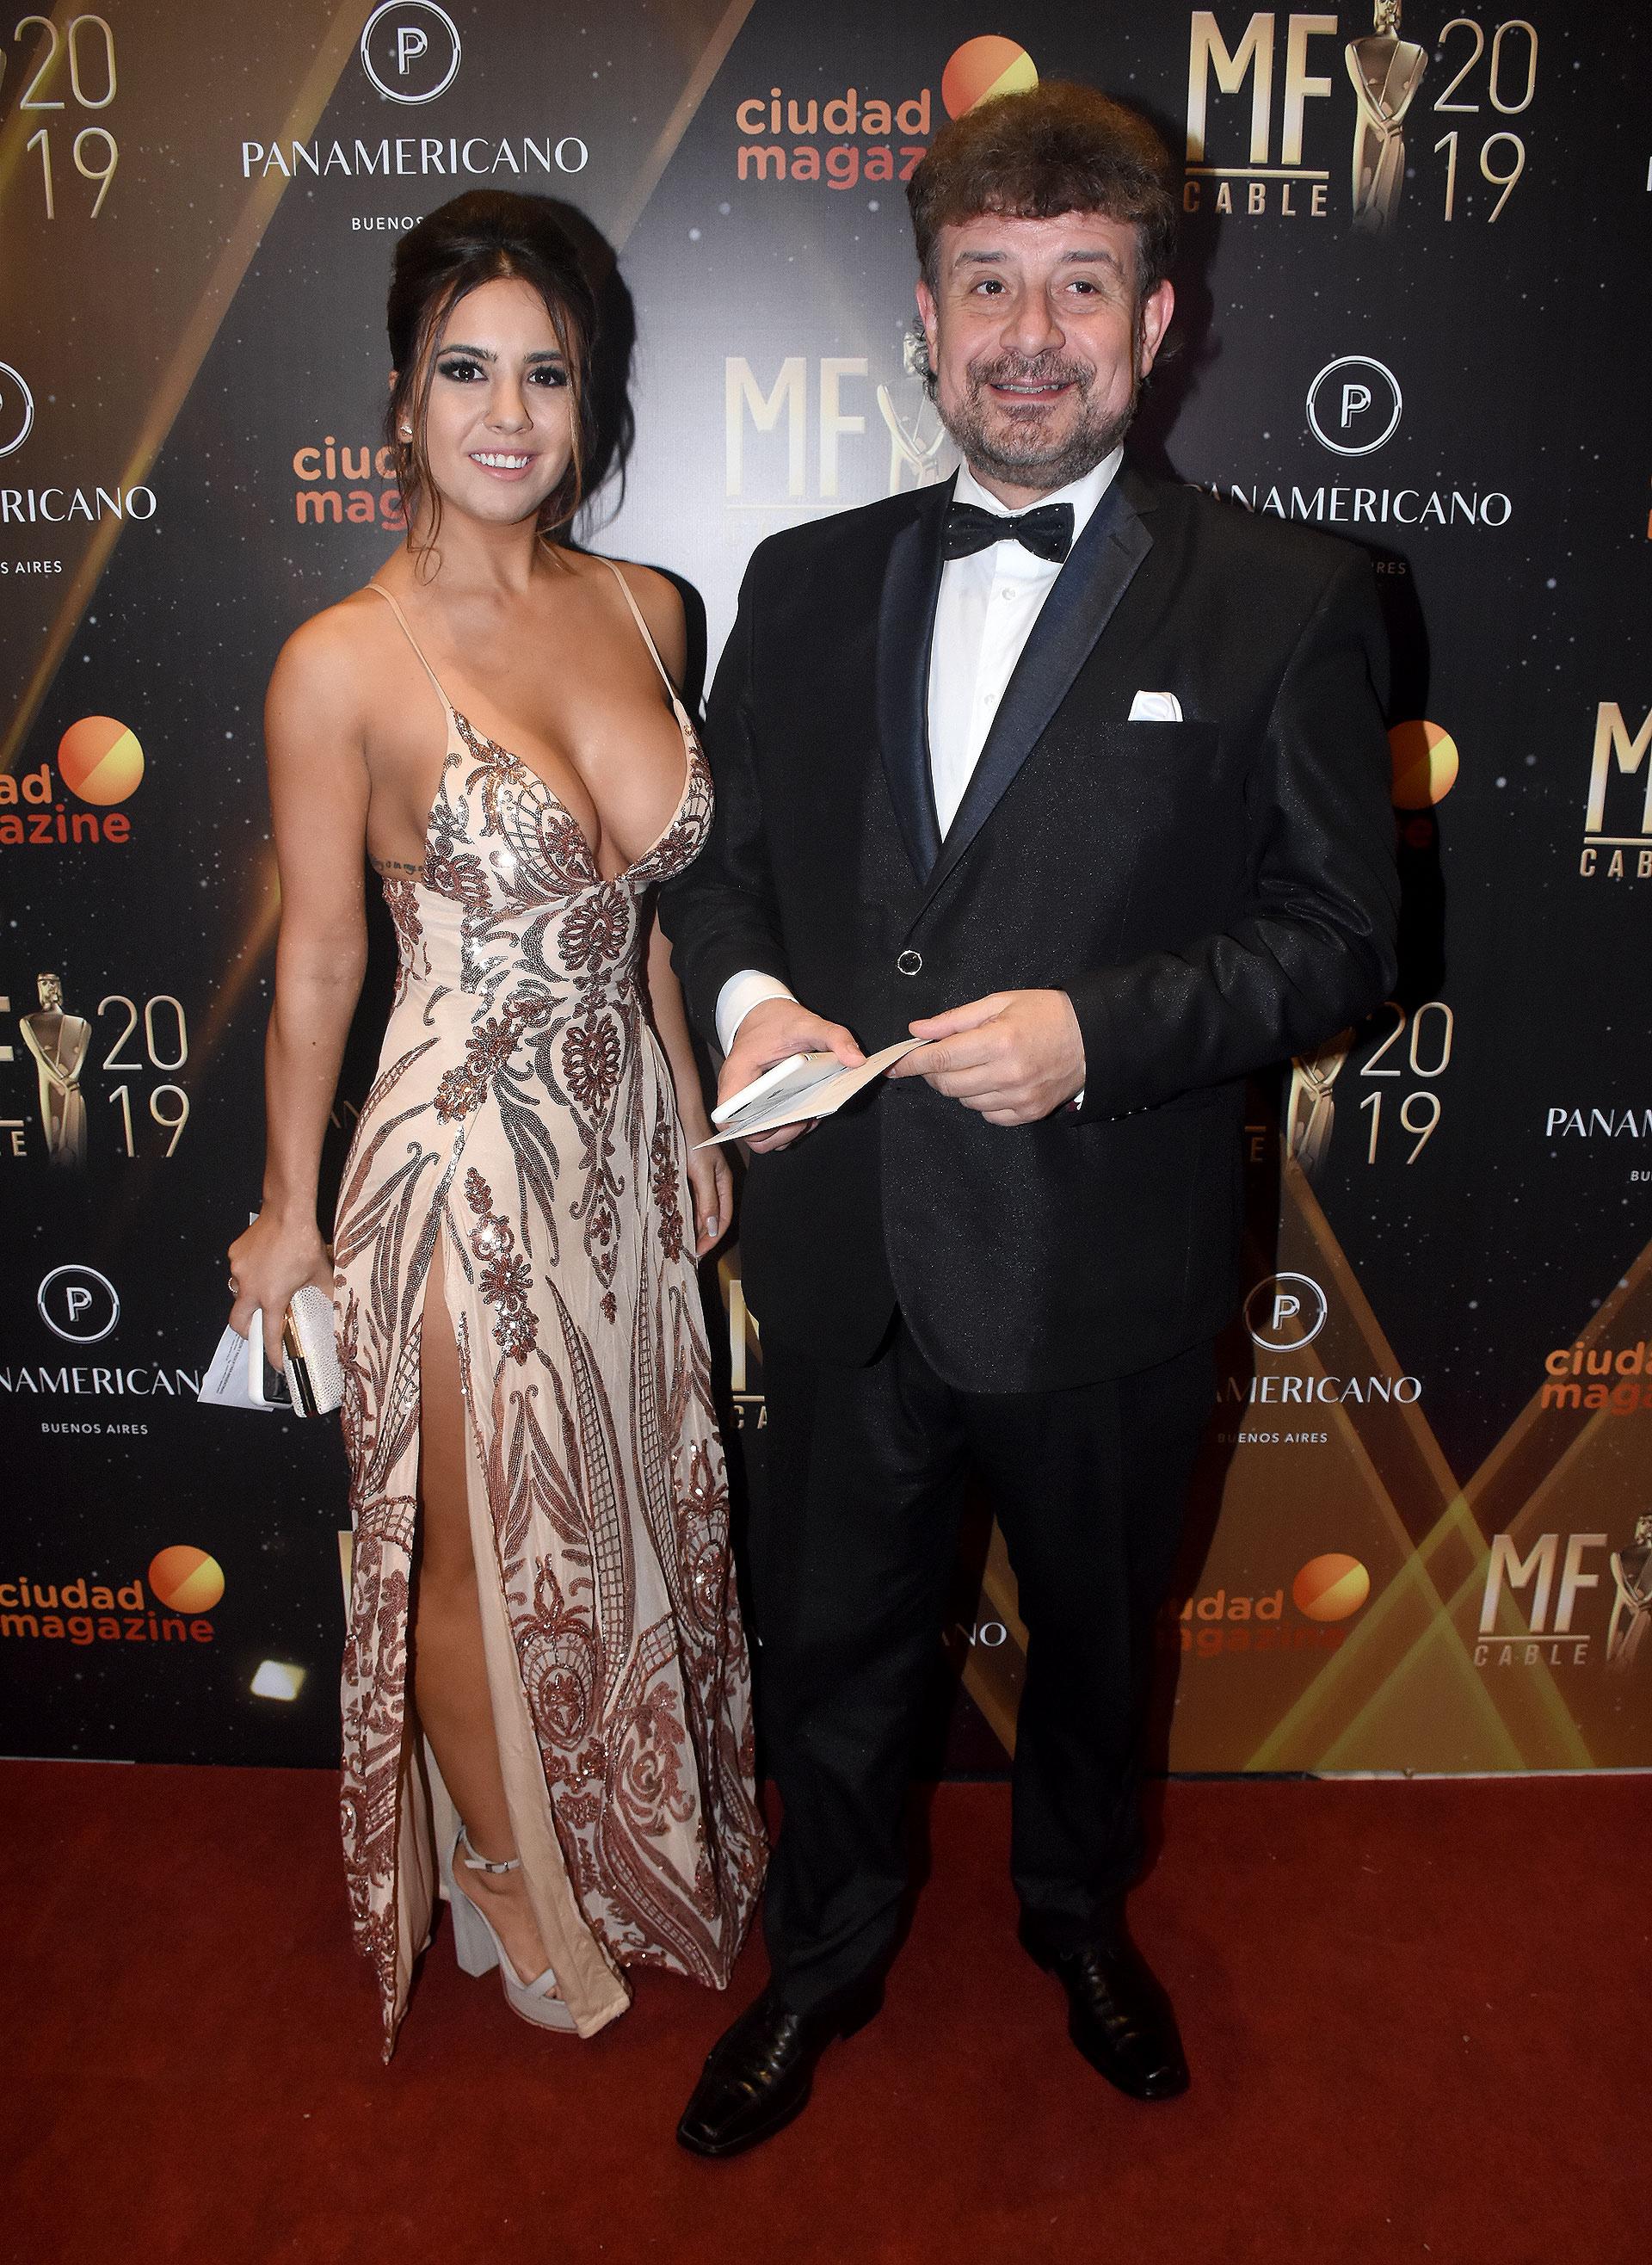 Ayelen Garavaglia y Daniel Mollo